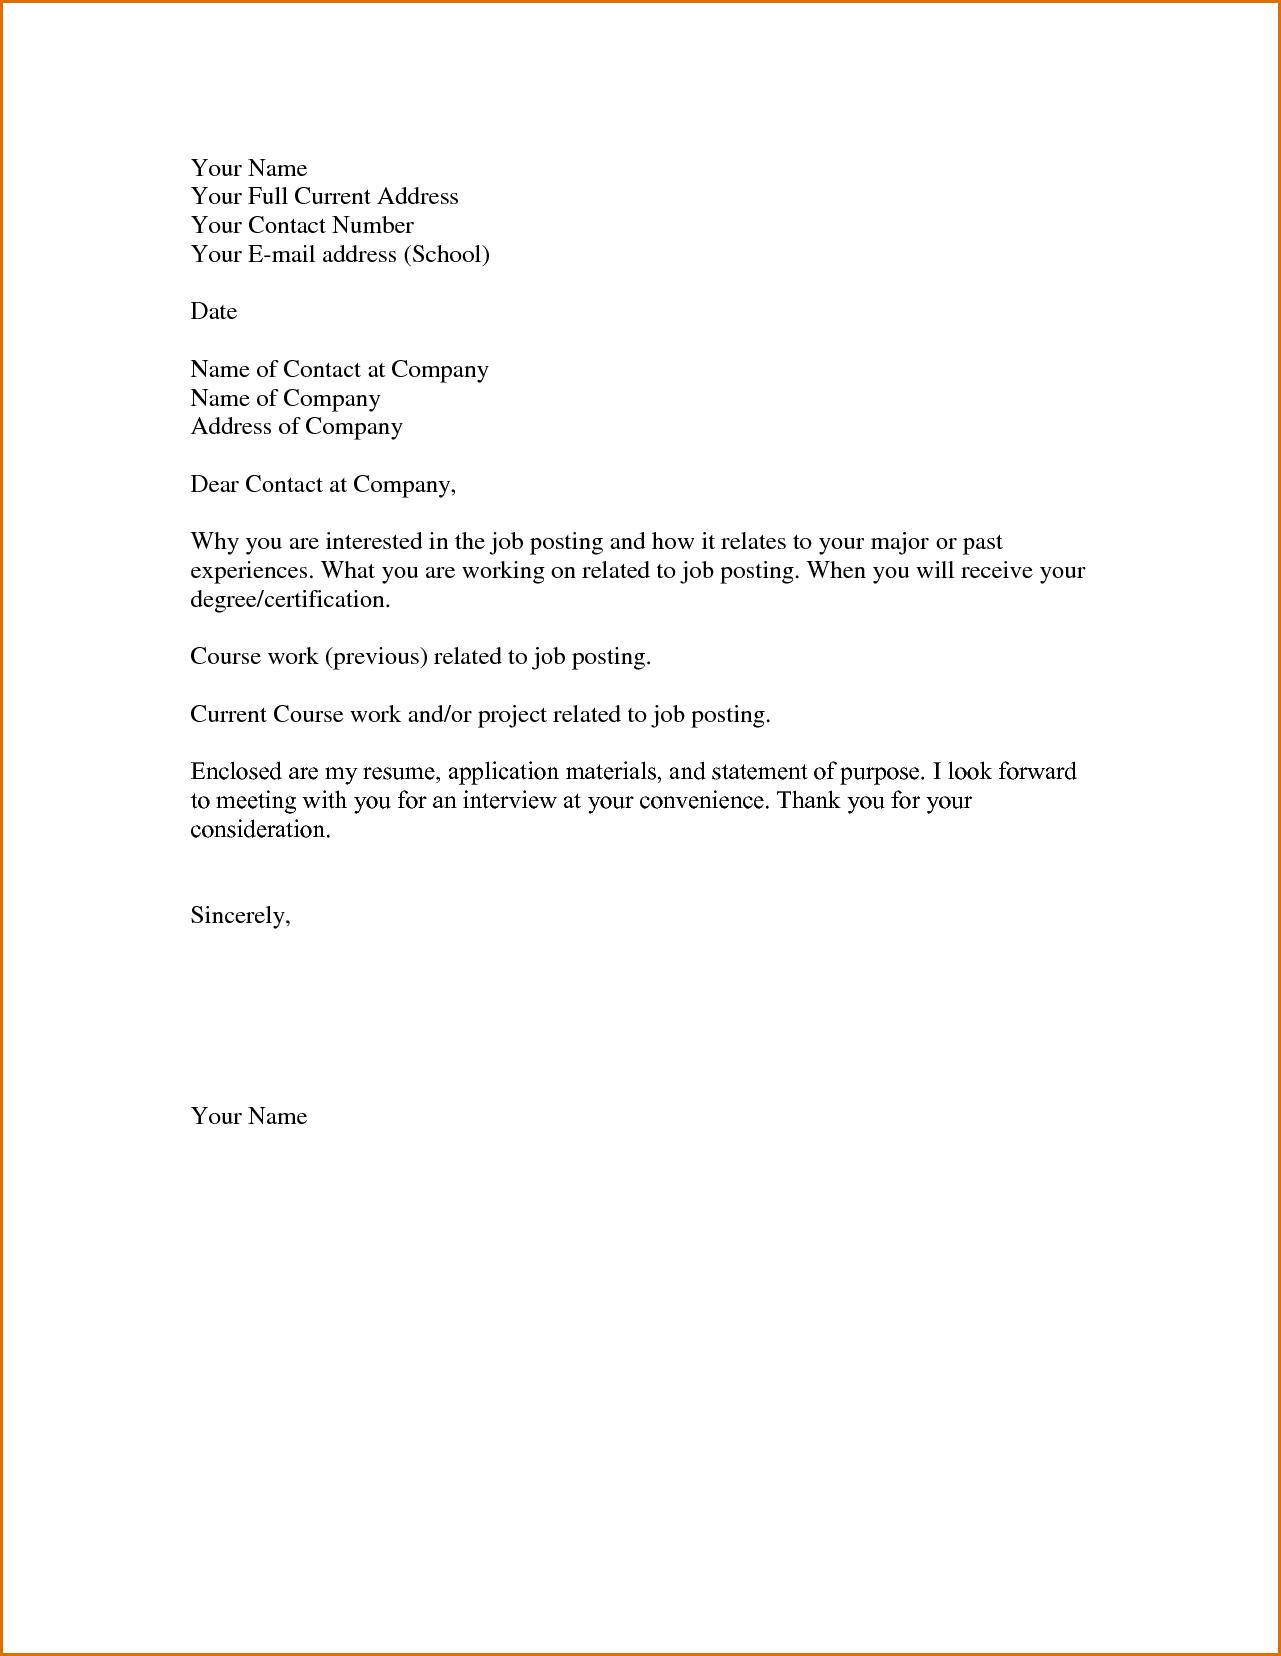 Quick Cover Letter Template , cover CoverLetterTemplate letter ...